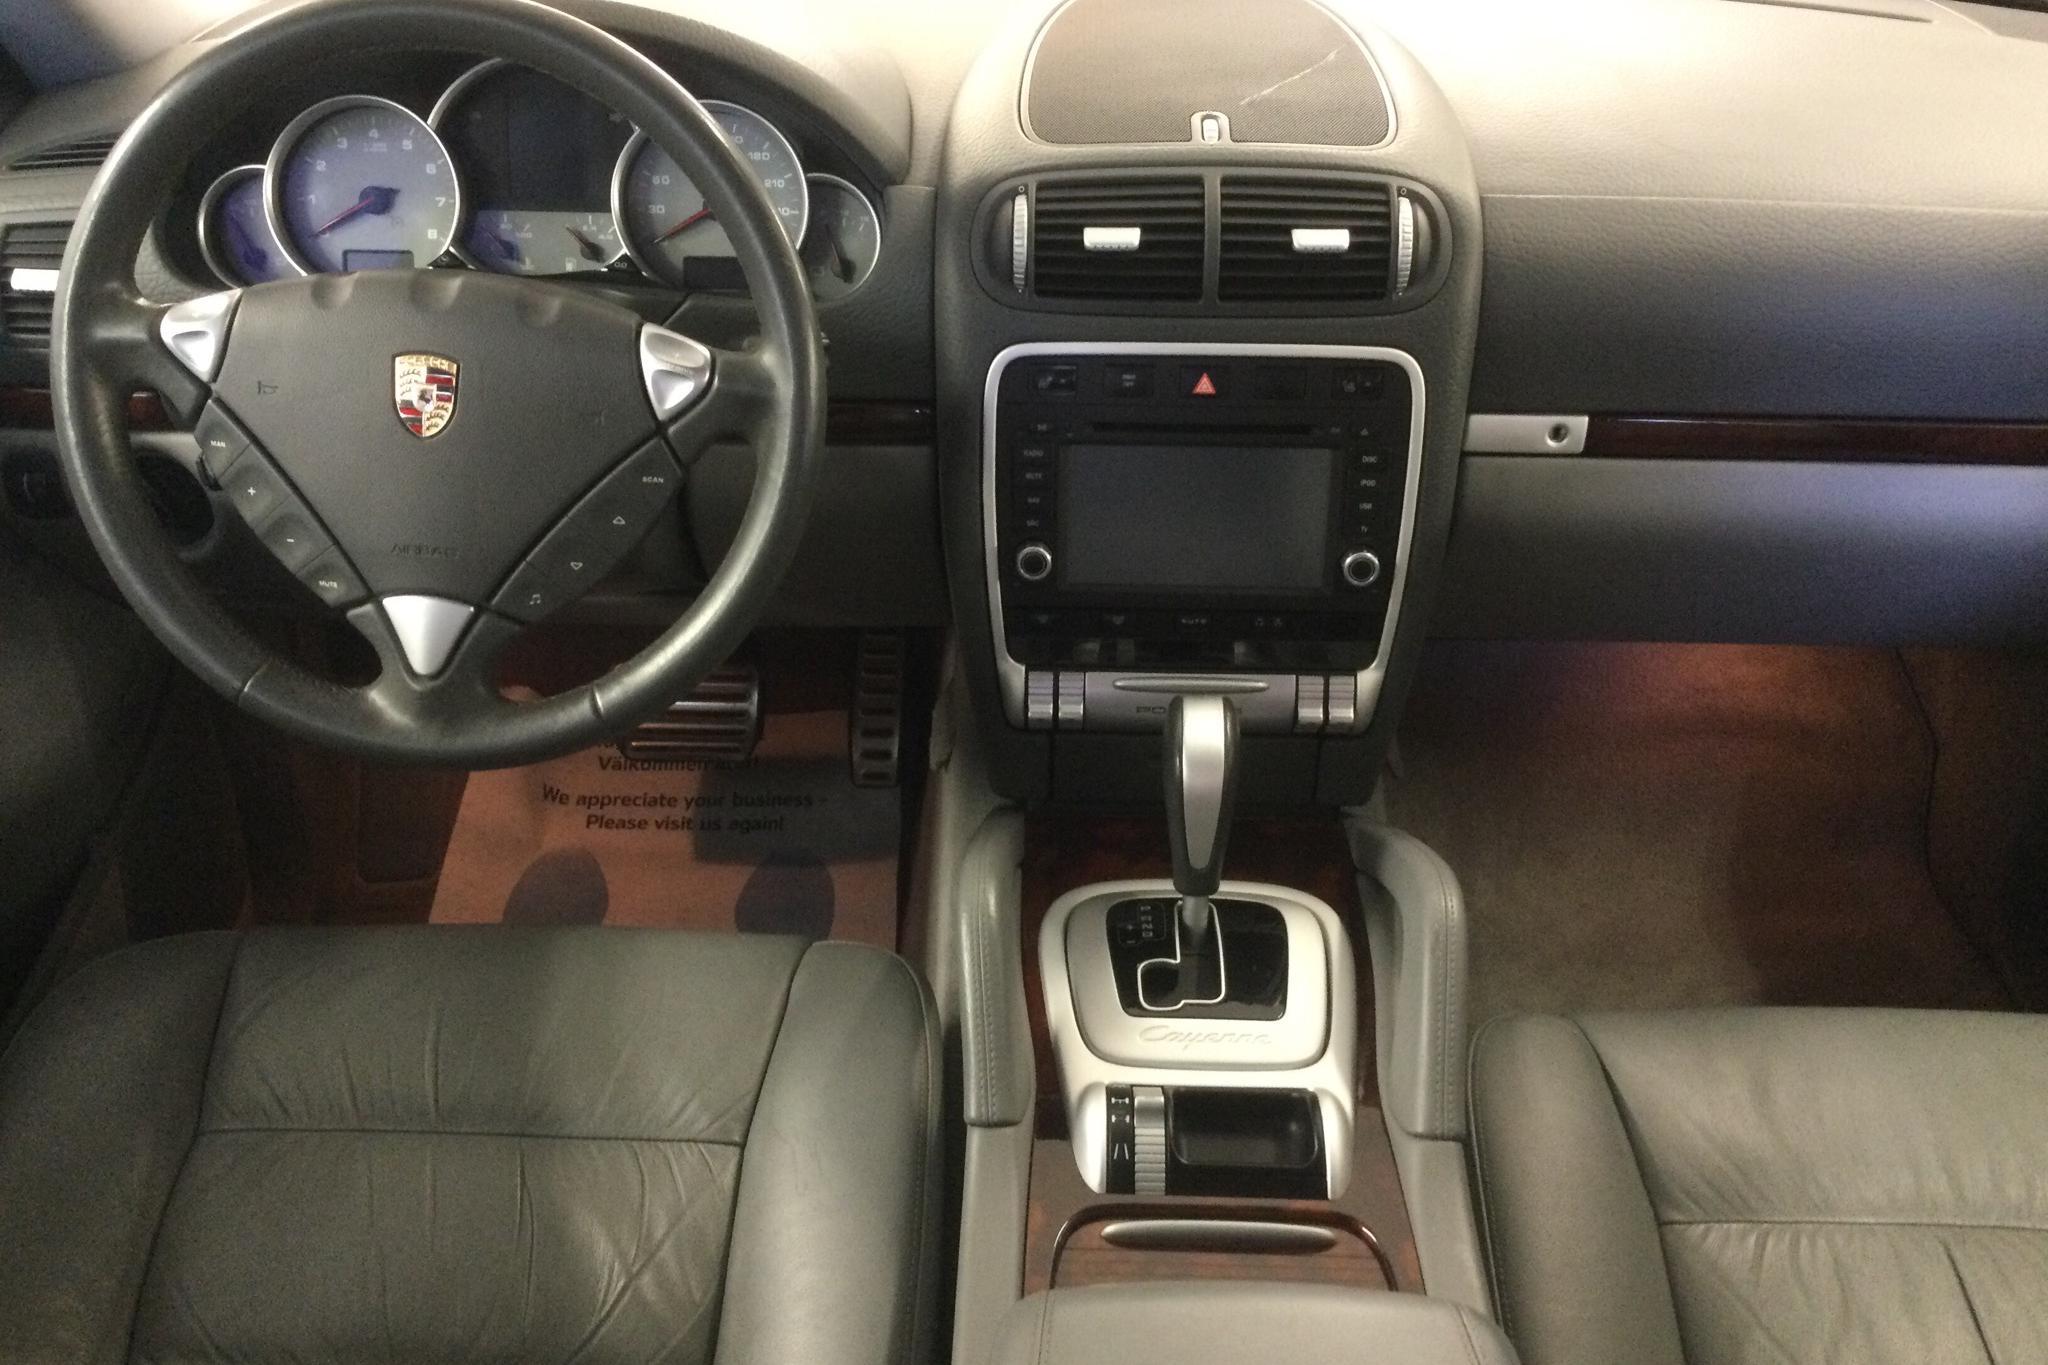 Porsche Cayenne S 4.5 (340hk) - 13 787 mil - Automat - svart - 2004